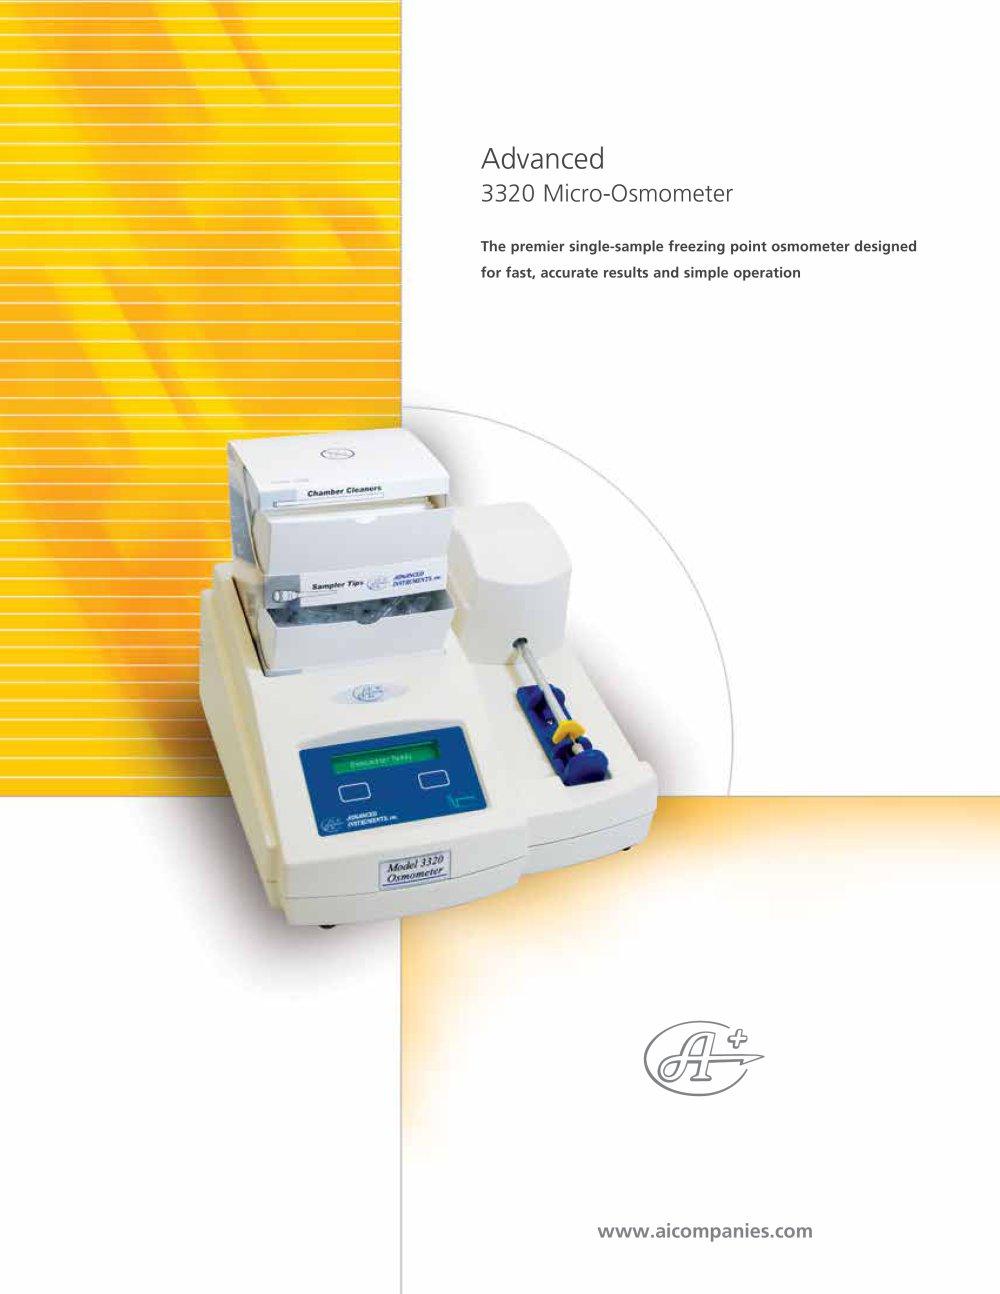 Advanced® model 3320 micro-osmometer advanced instruments inc.